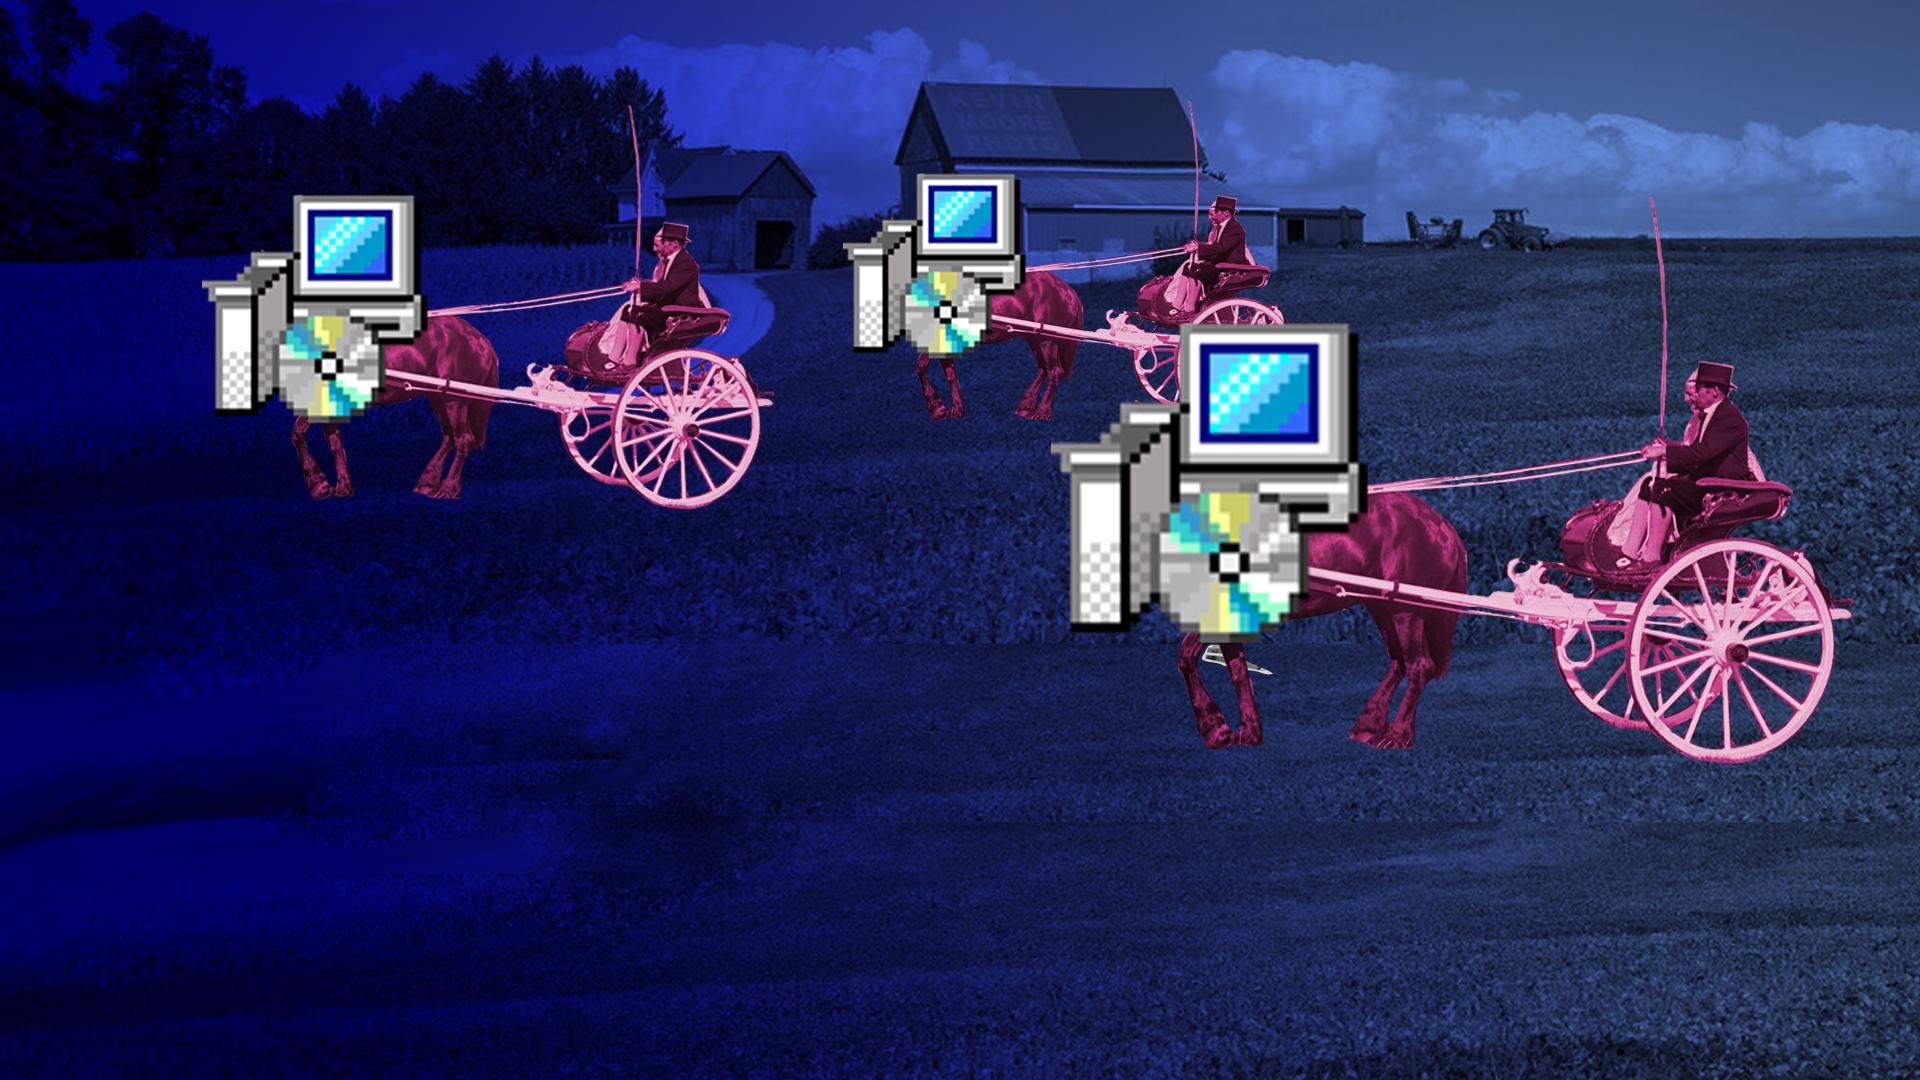 191216_header_data_amish_computer_blauw